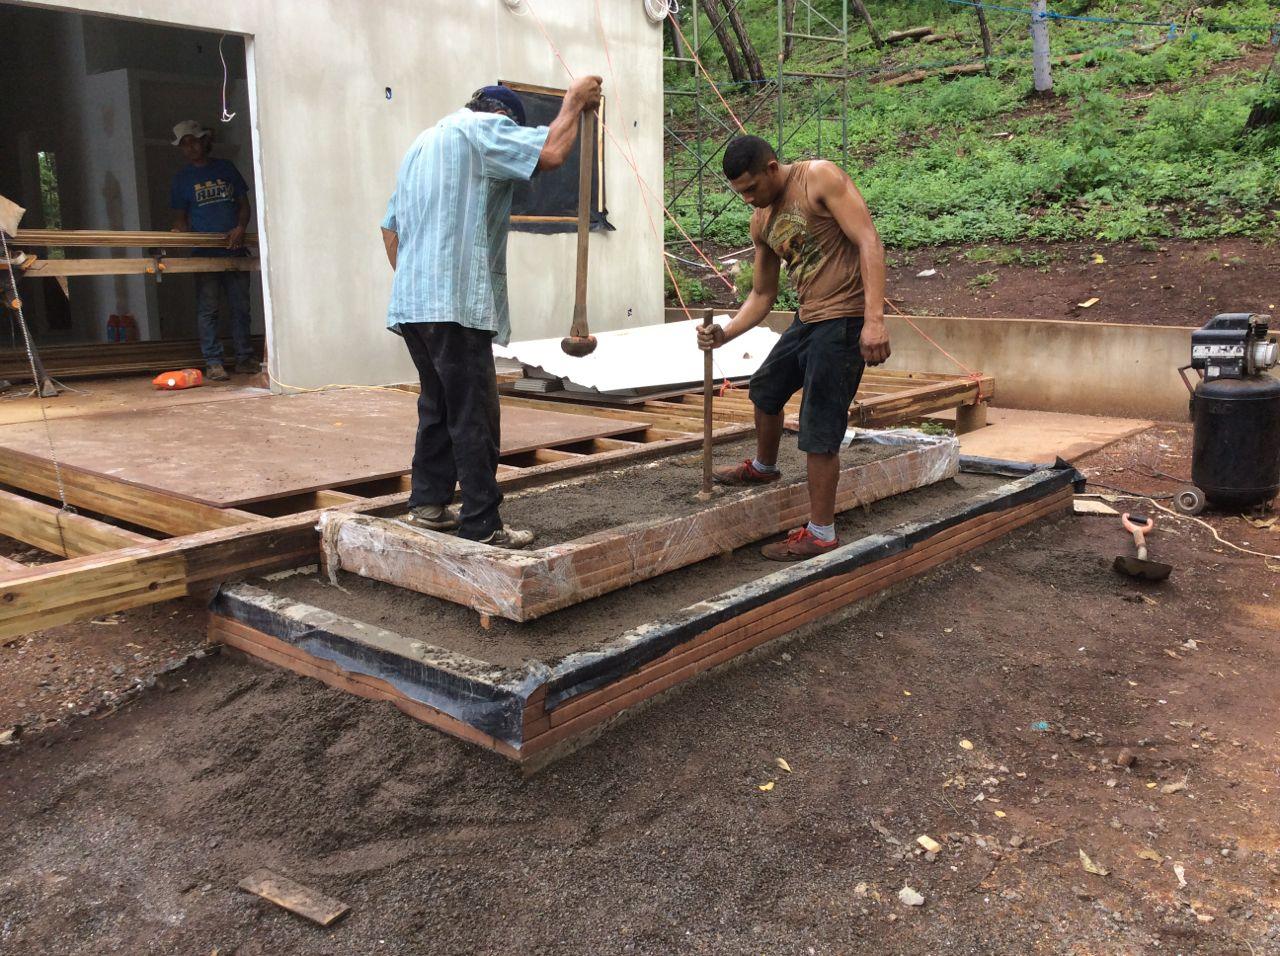 Compacting step base